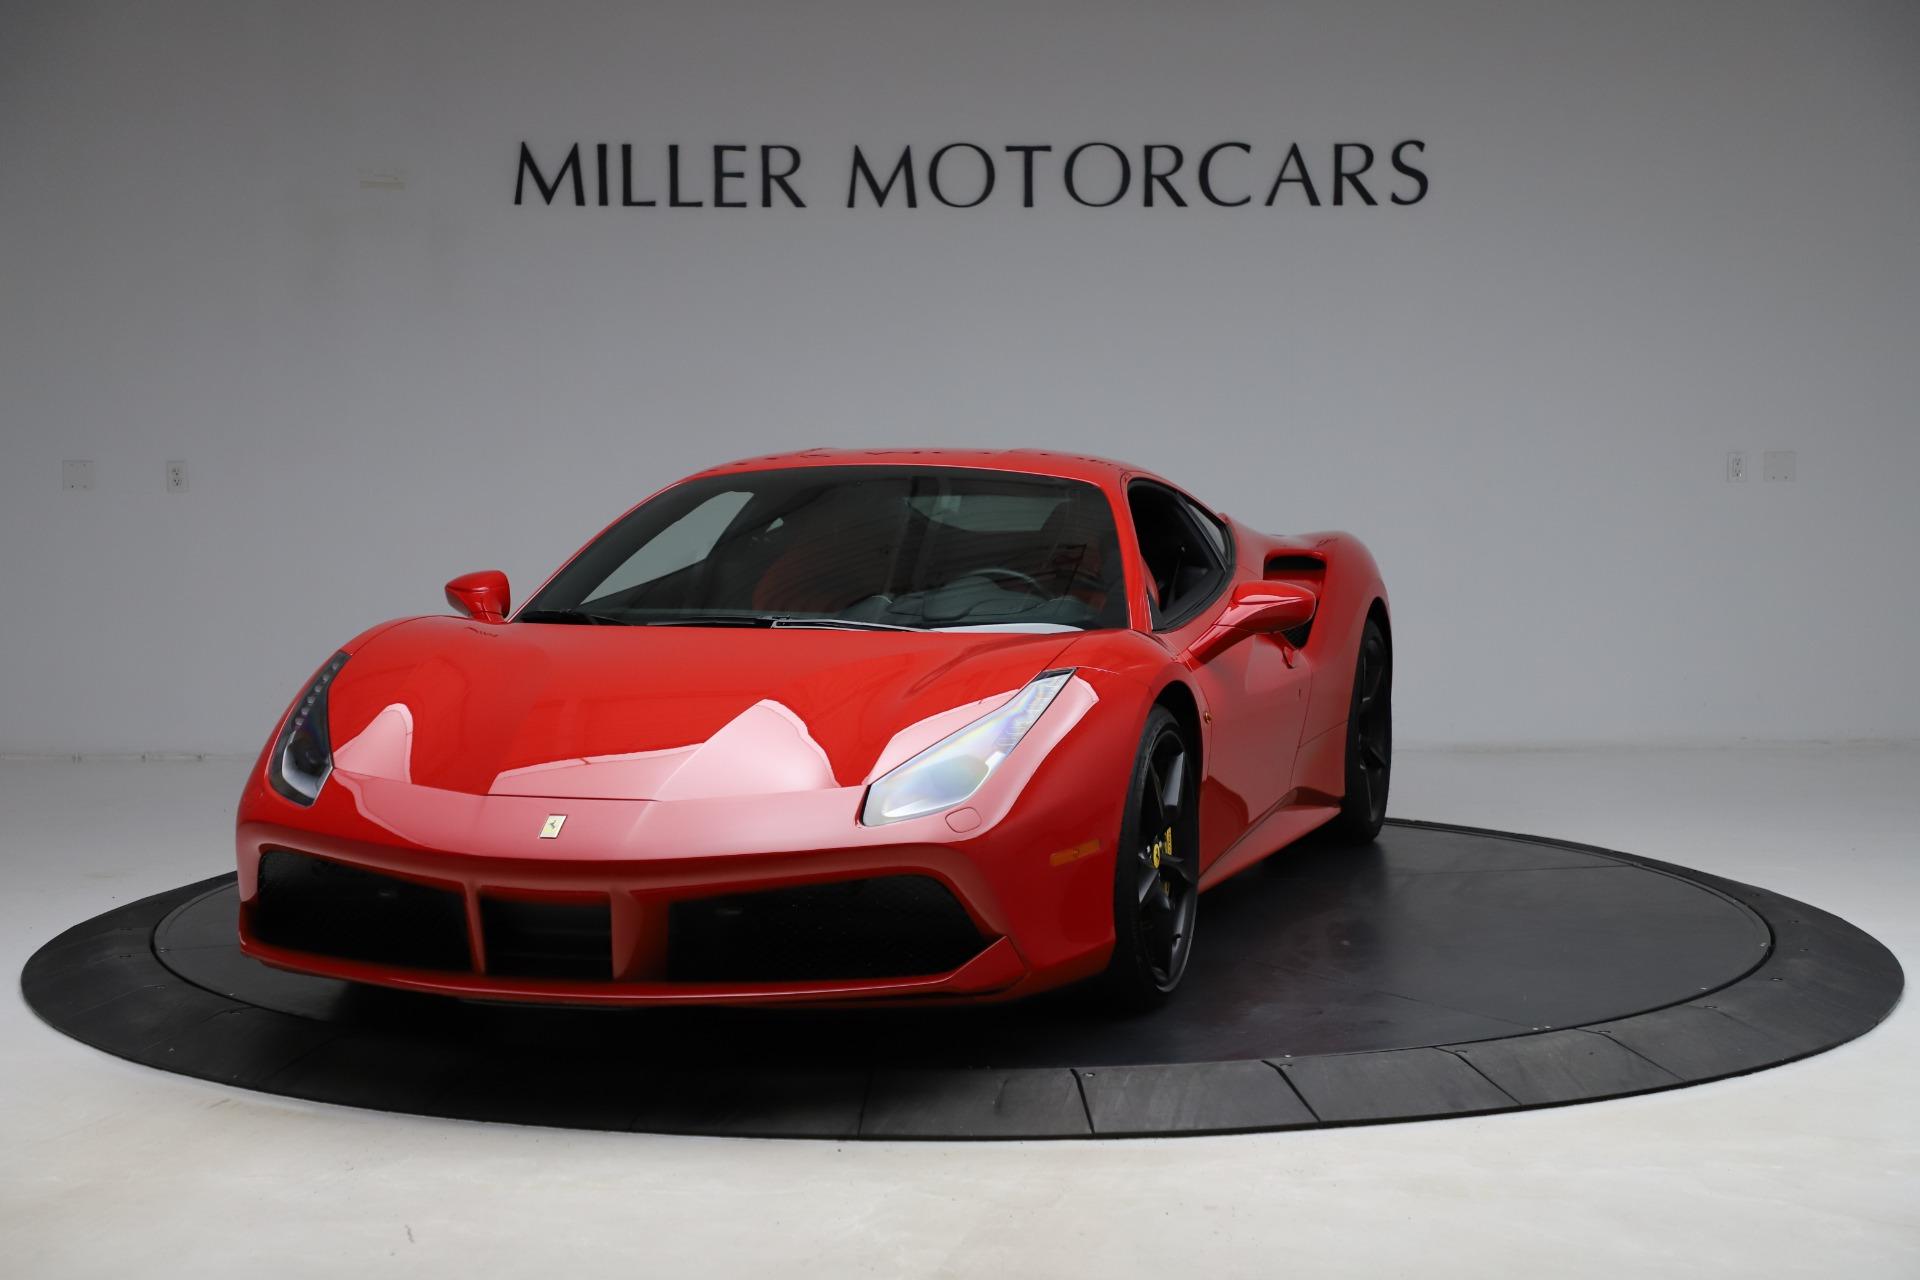 Used 2018 Ferrari 488 GTB for sale Sold at Maserati of Greenwich in Greenwich CT 06830 1